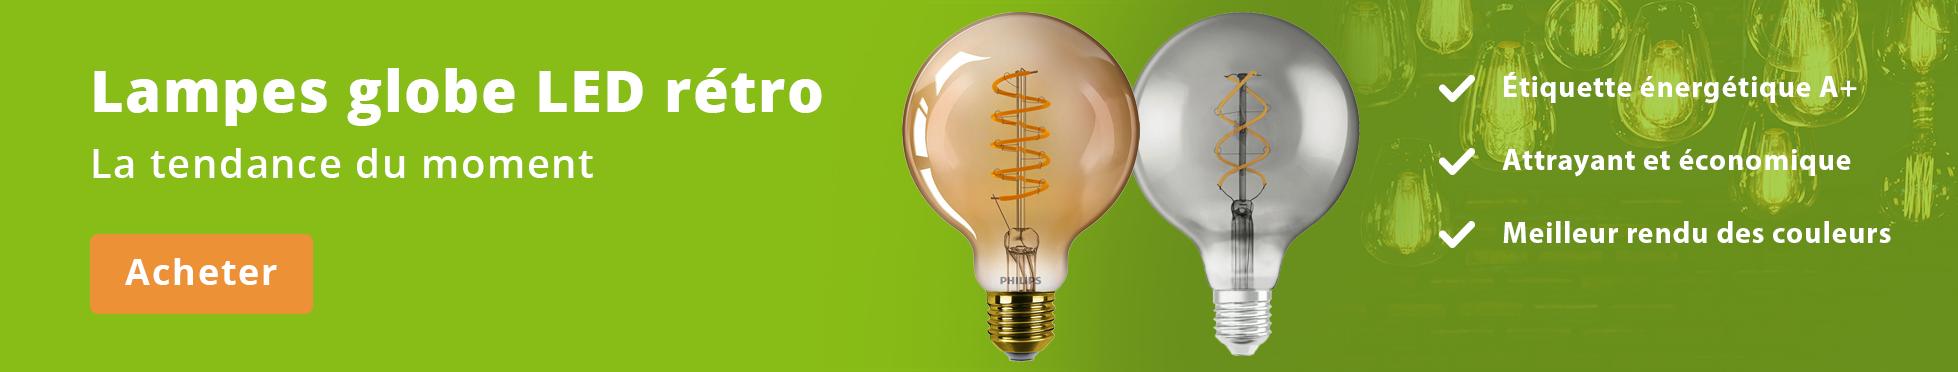 BL Retro LED bulbs FR B0123